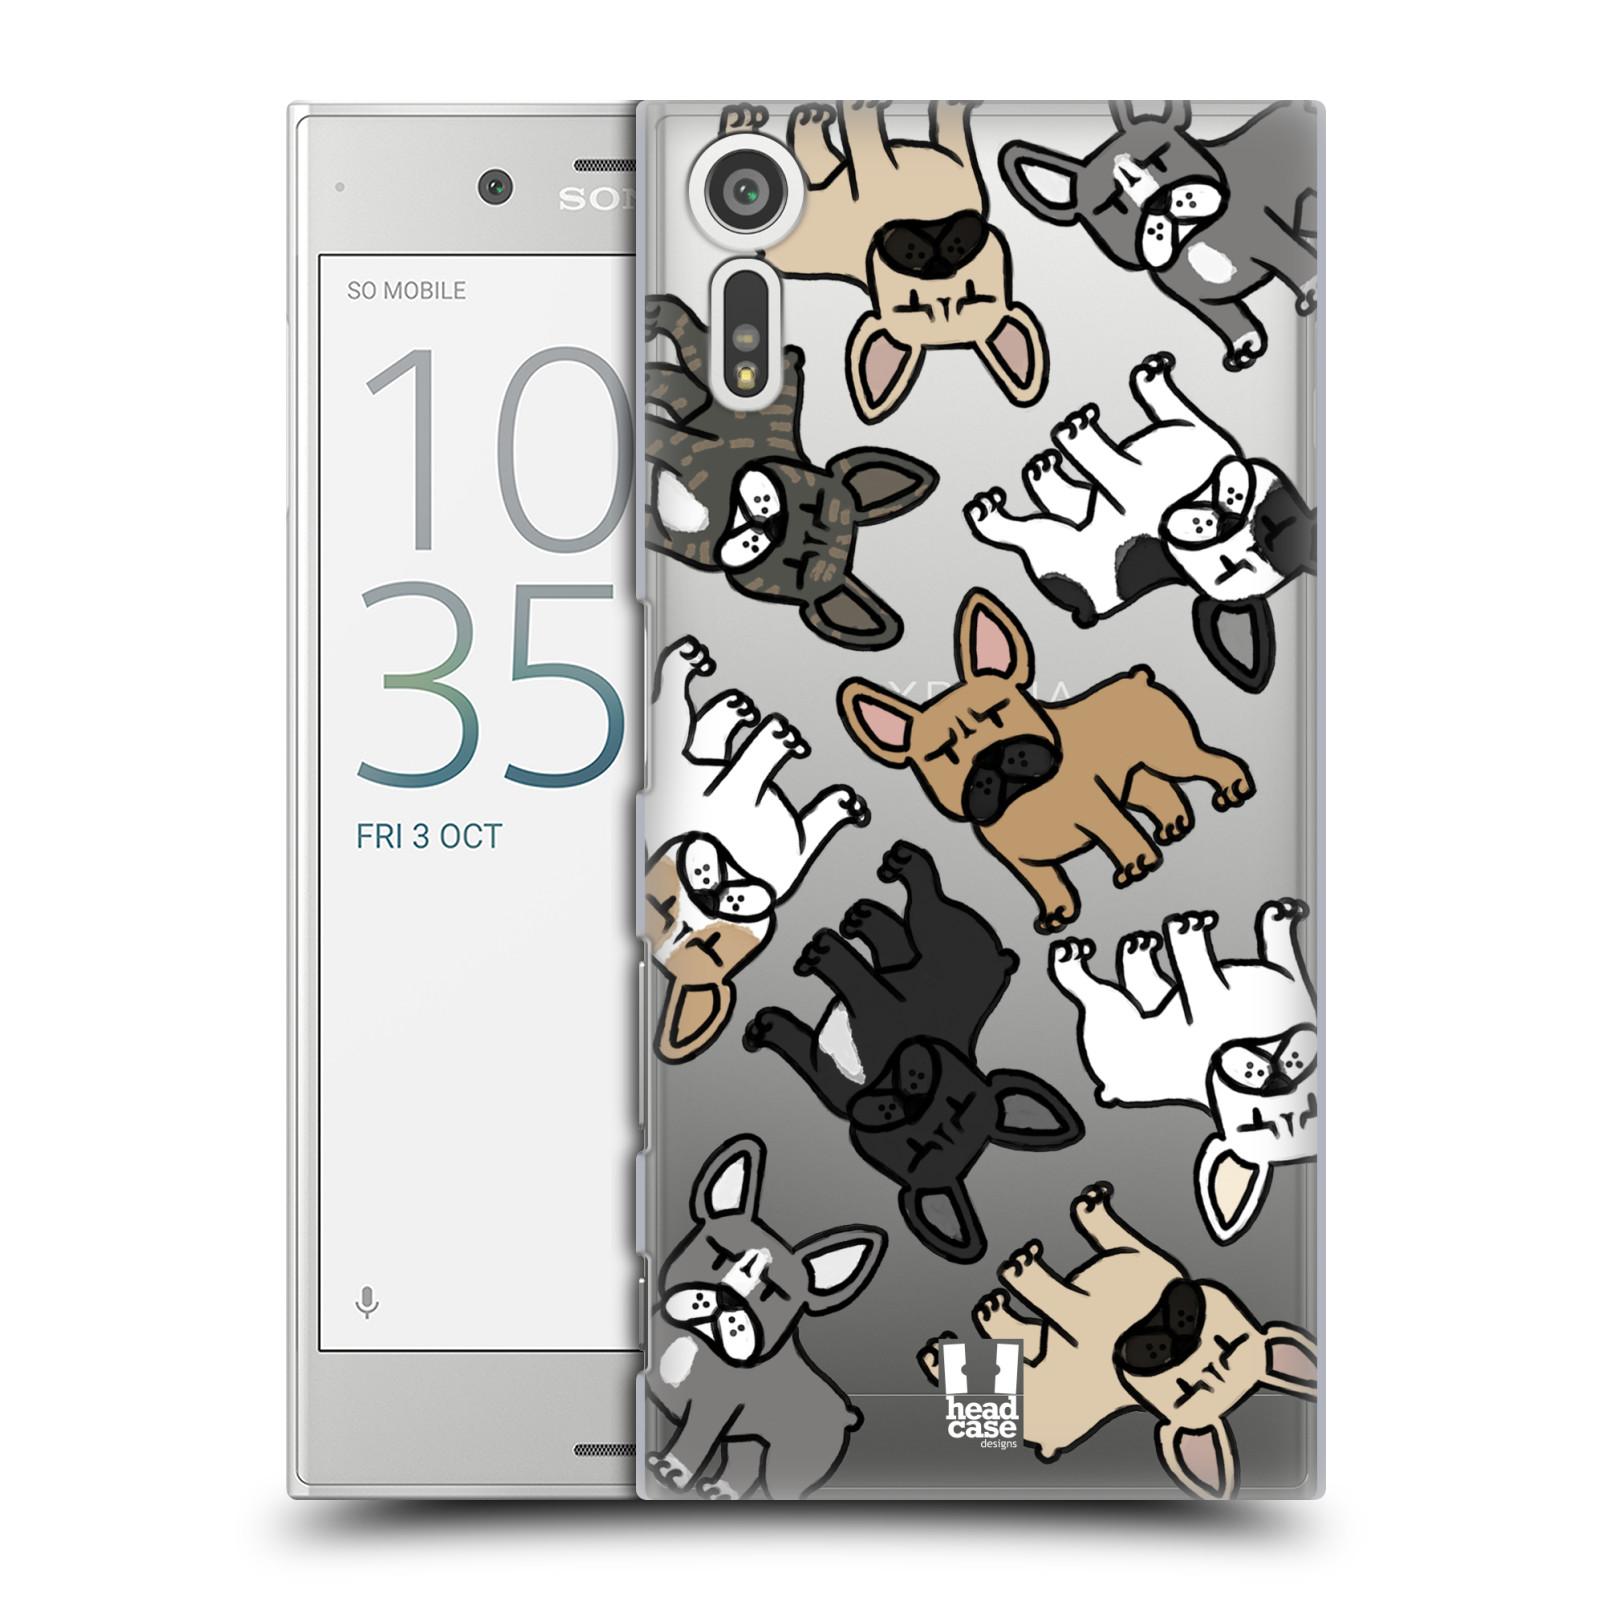 HEAD CASE plastový obal na mobil Sony Xperia XZ pejsek francouzský buldog